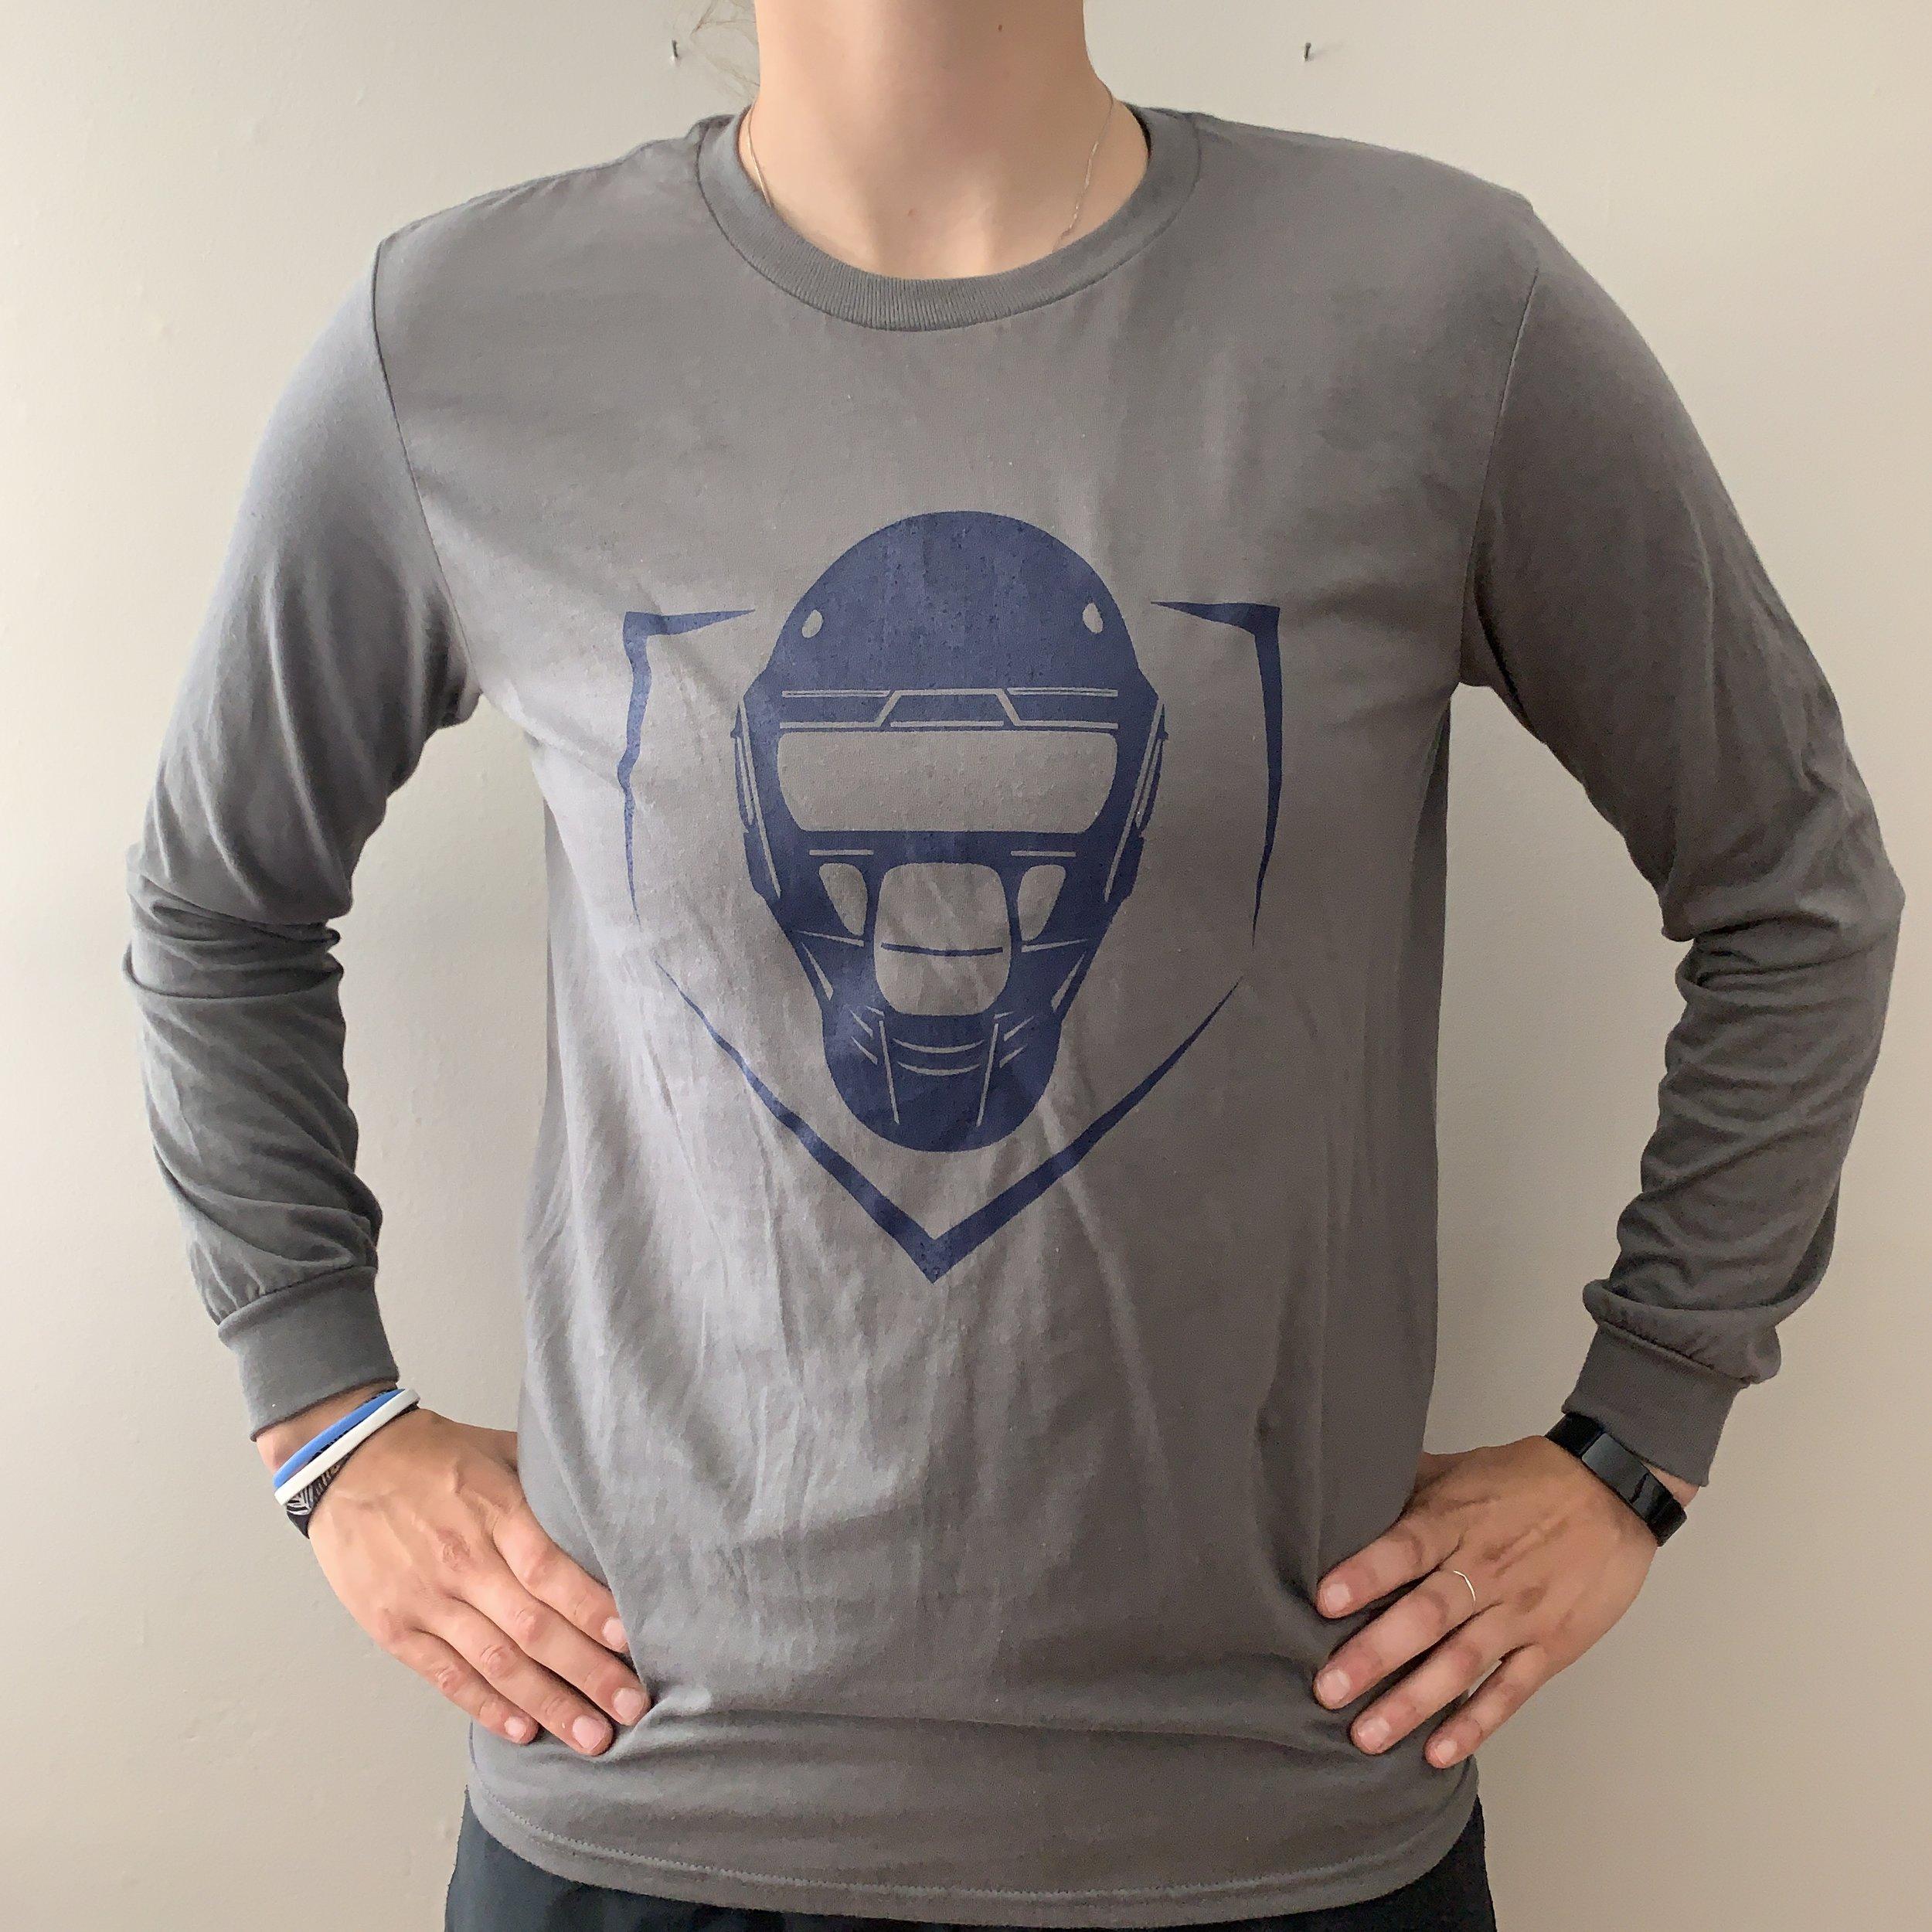 Plate Logo Long Sleeve T-Shirt – Graphite  $25